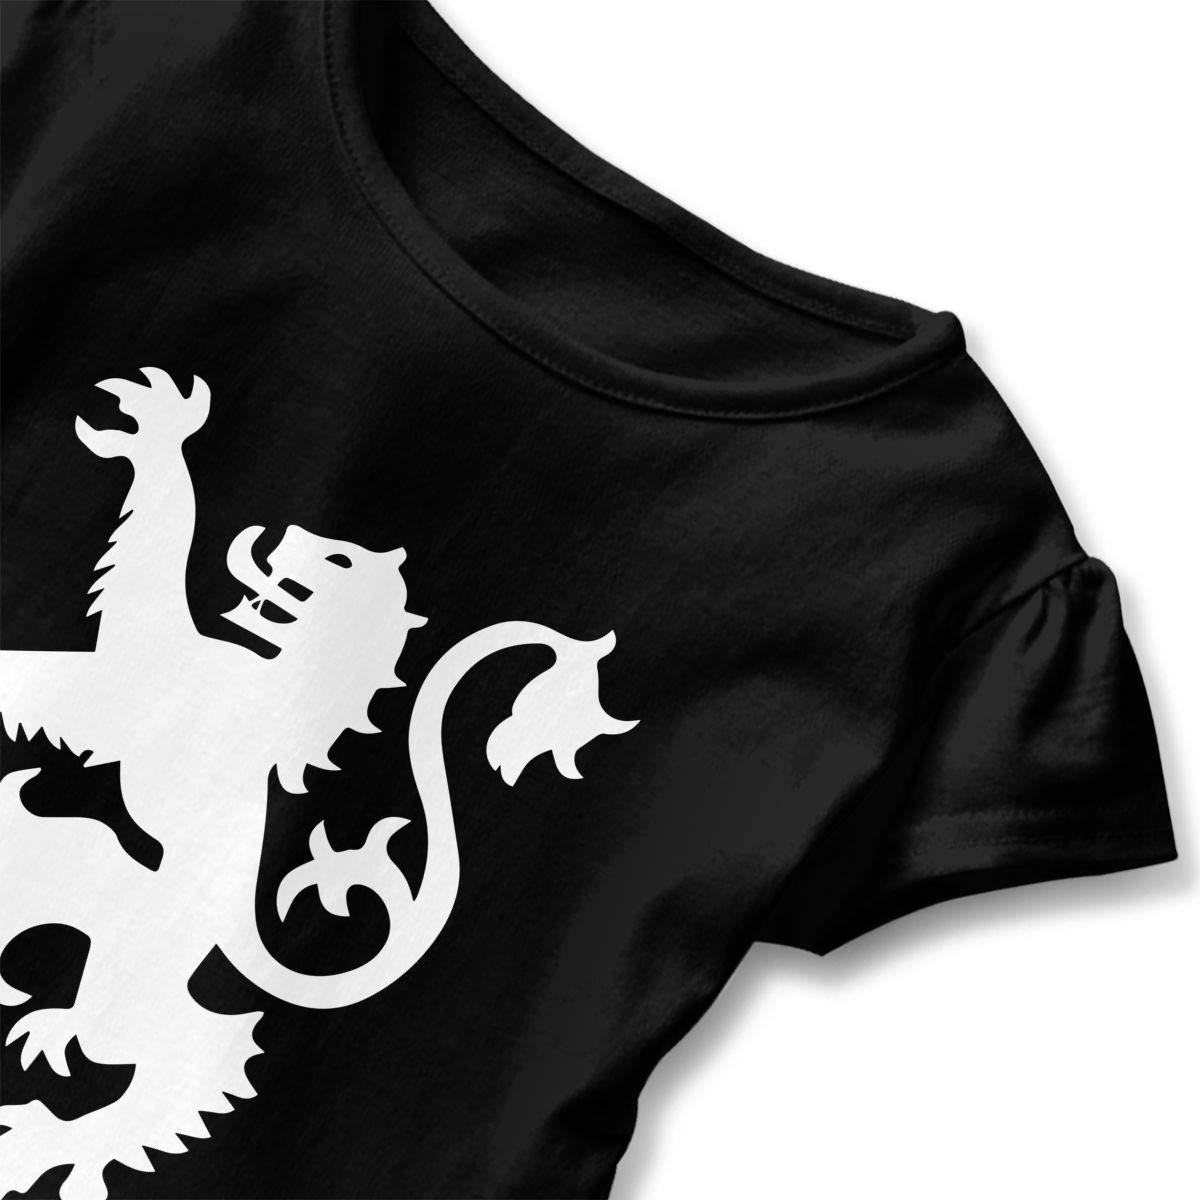 HYBDX9T Little Girls Lion Rampant Scotland Scottish Funny Short Sleeve Cotton T Shirts Basic Tops Tee Clothes